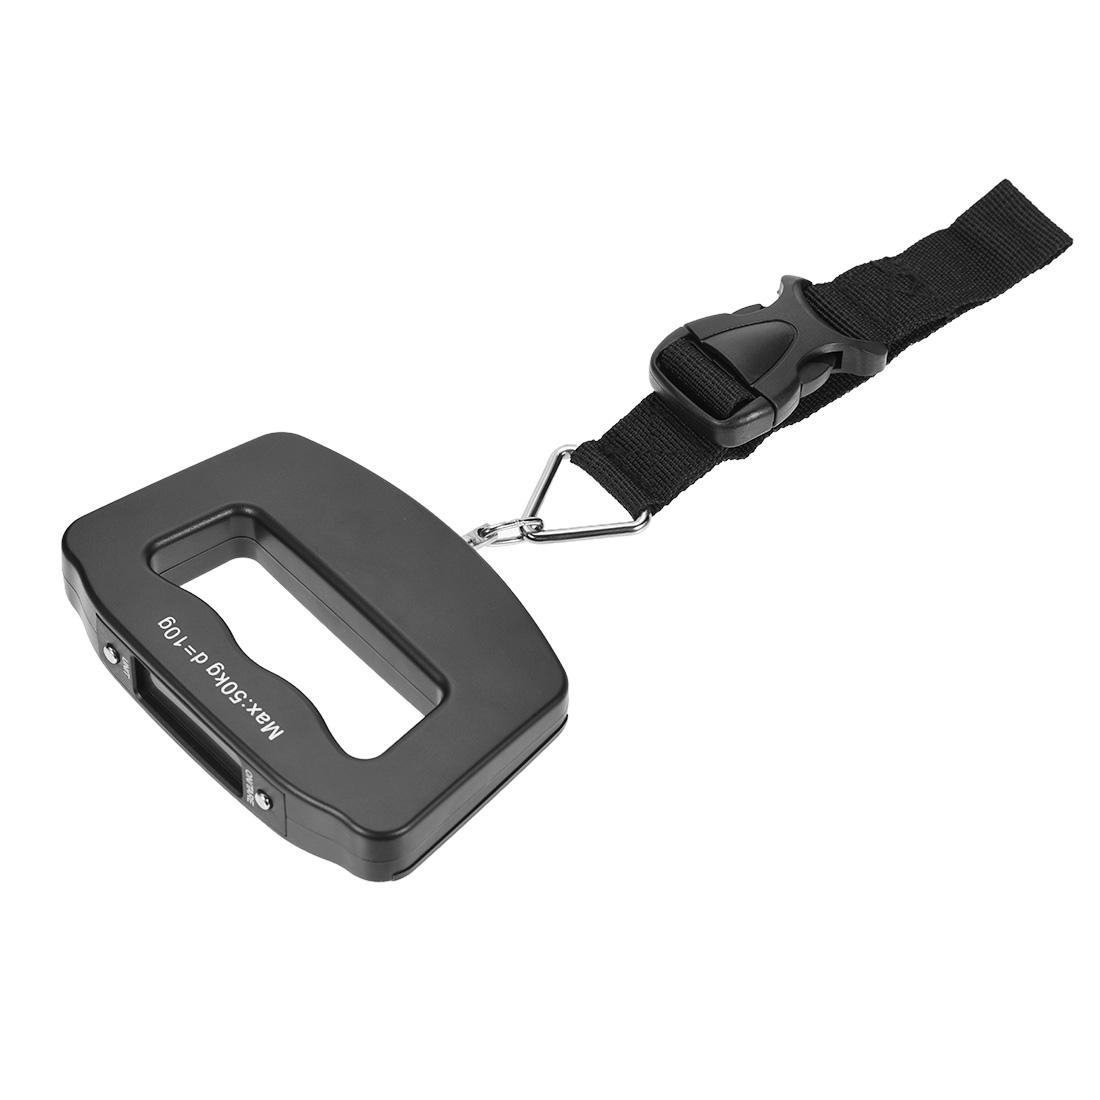 Digital Luggage Scale 50kg/10g Portable Handle Hanging Balance Weight Backlit